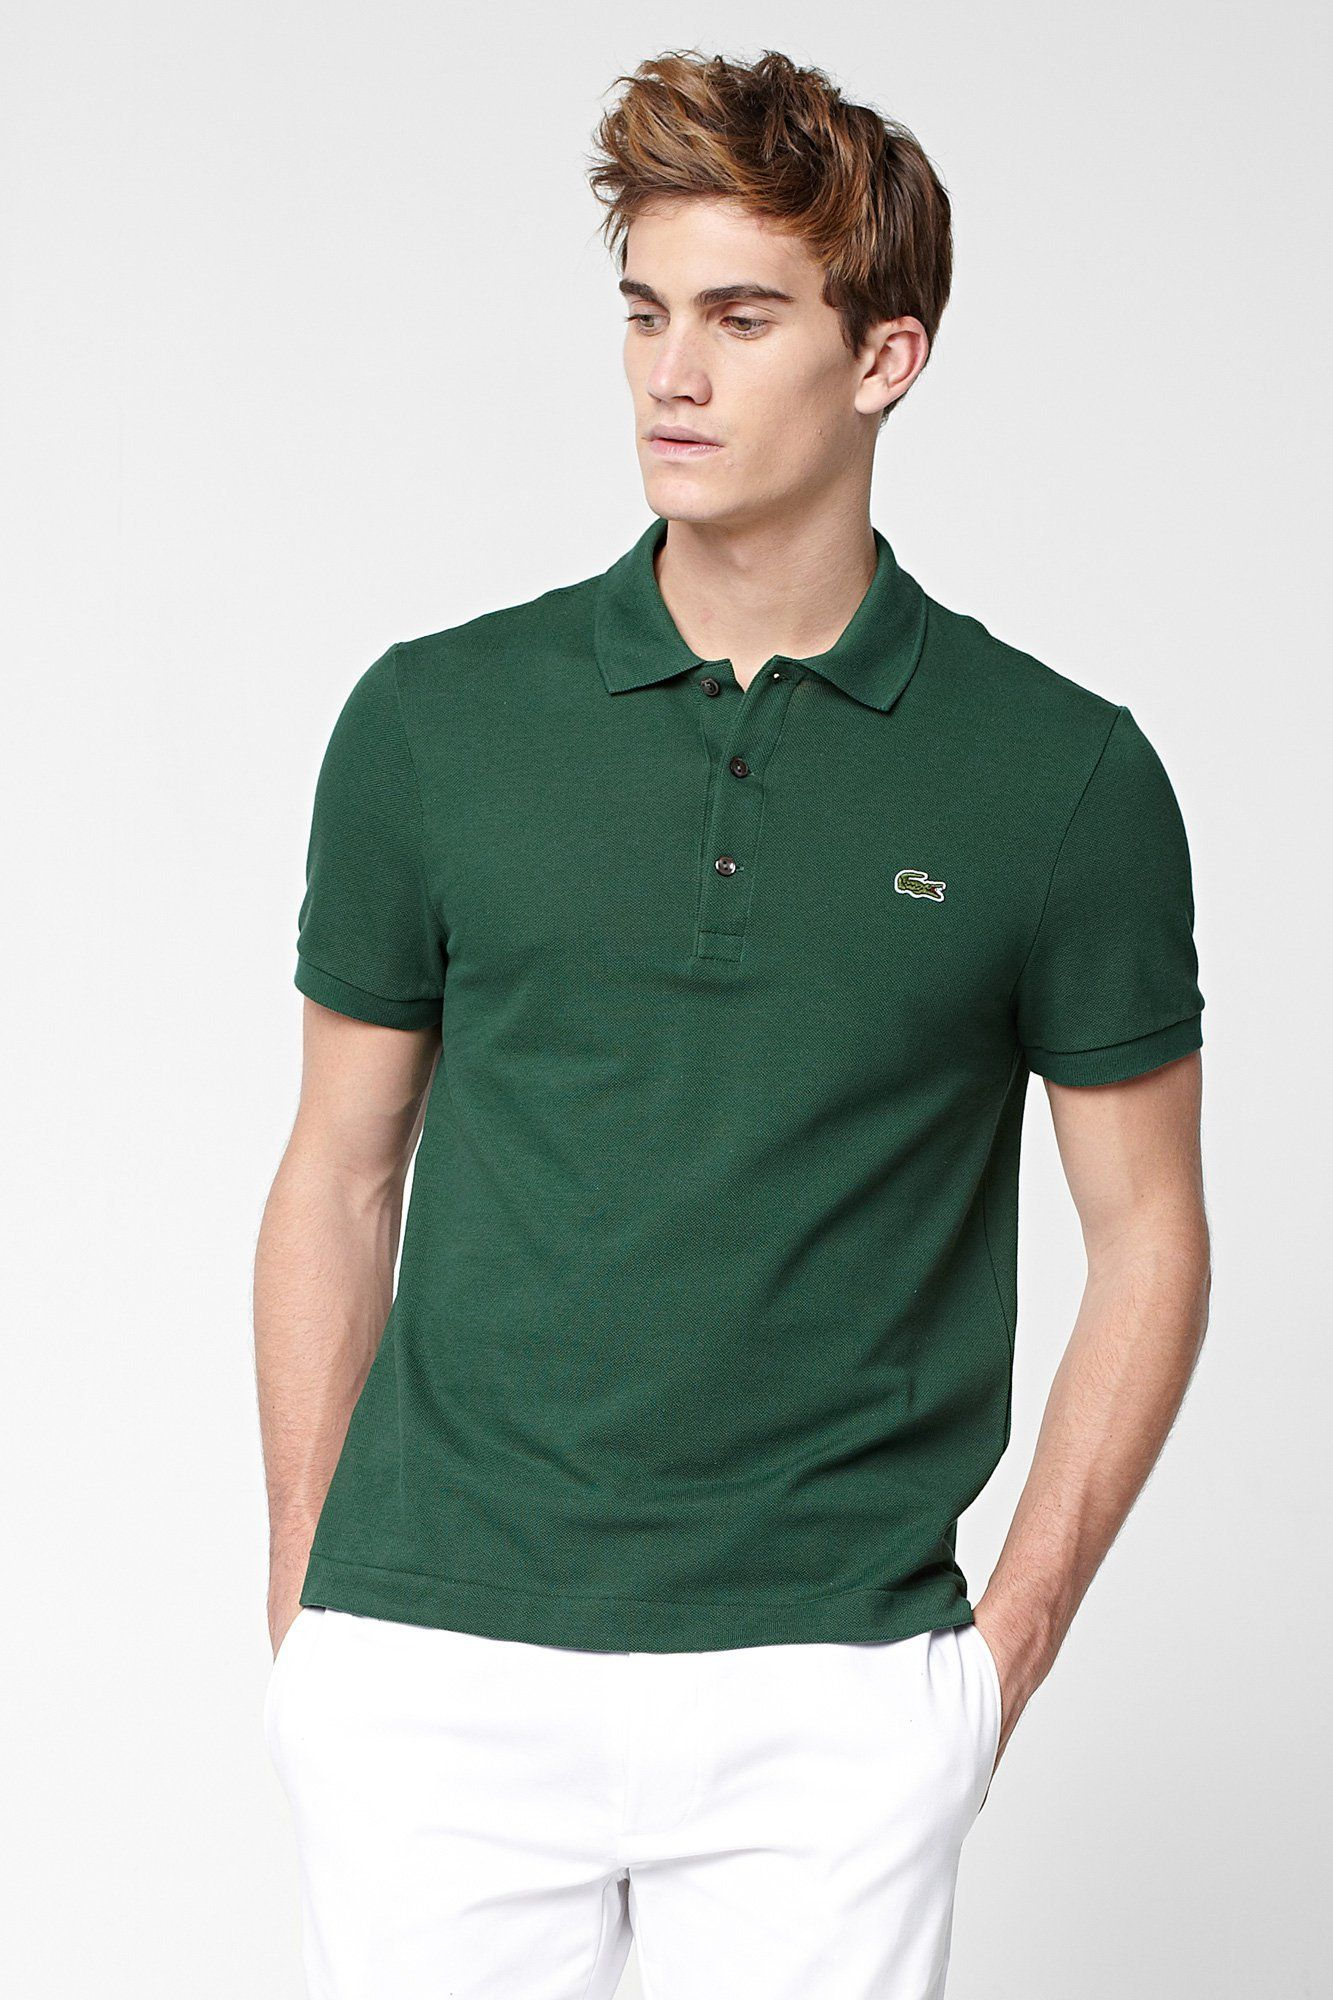 Leg day t shirts men s polo shirt slim - Lacoste Short Sleeve Slim Fit Pique Polo Shirt